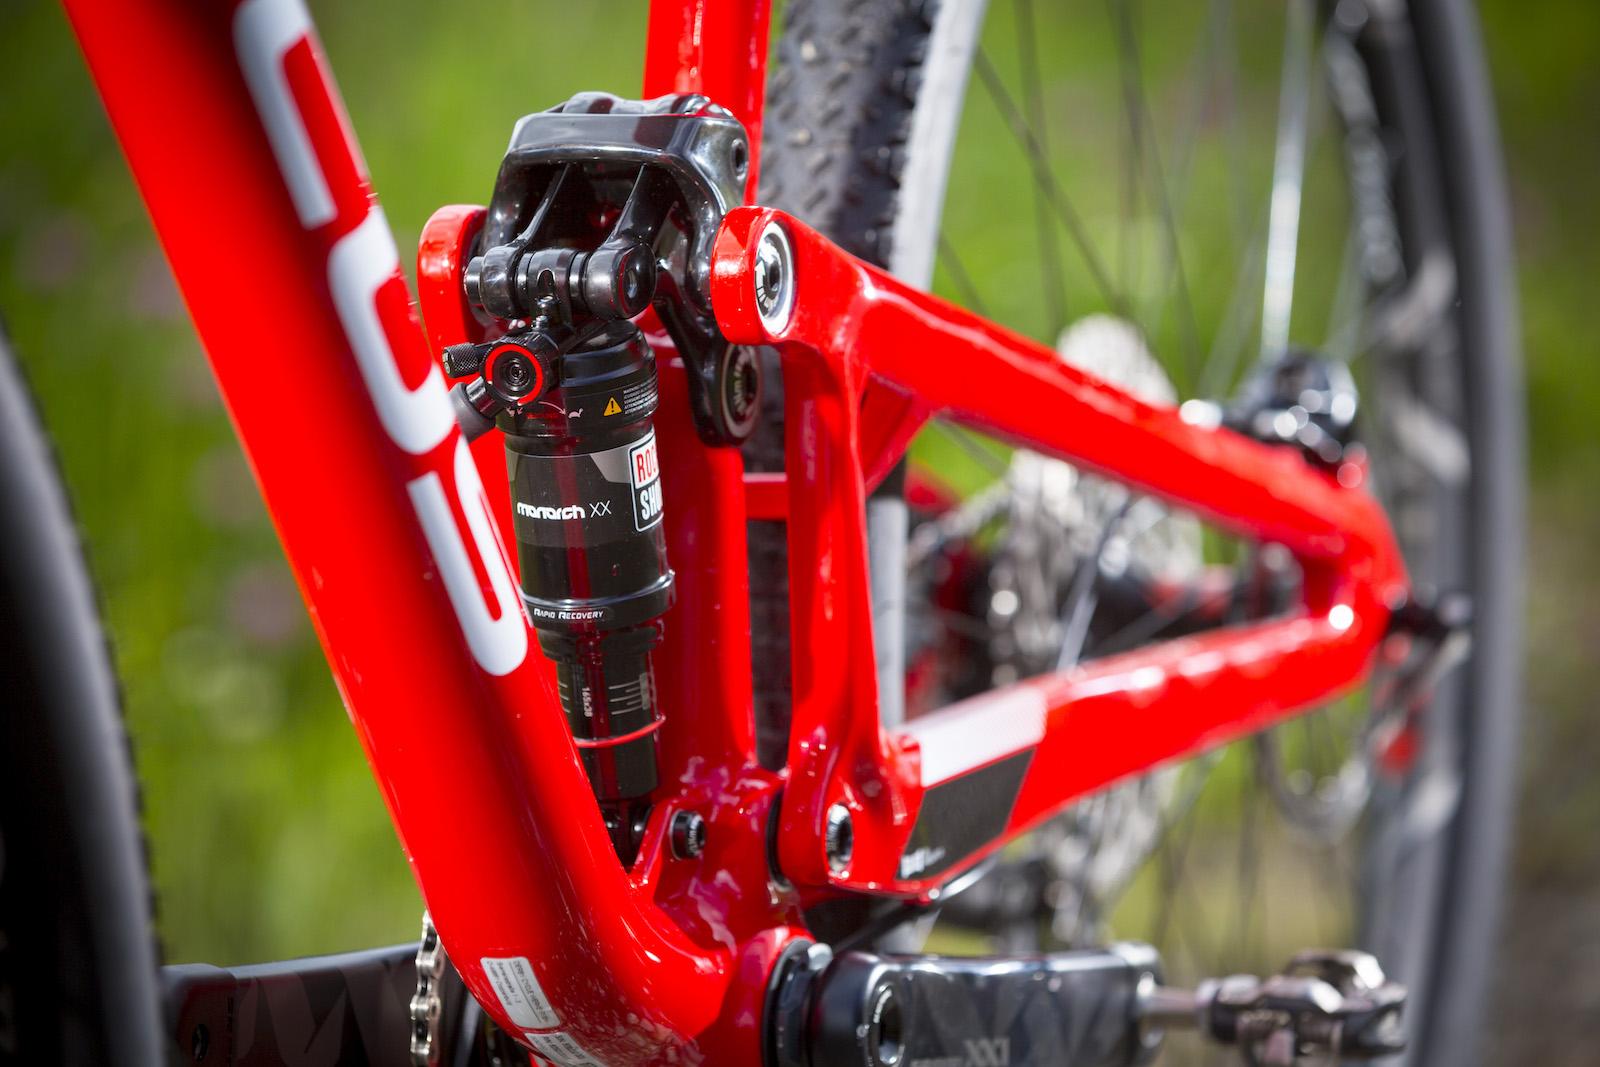 GD255805_Focus Morzine 2016 Bikes_One